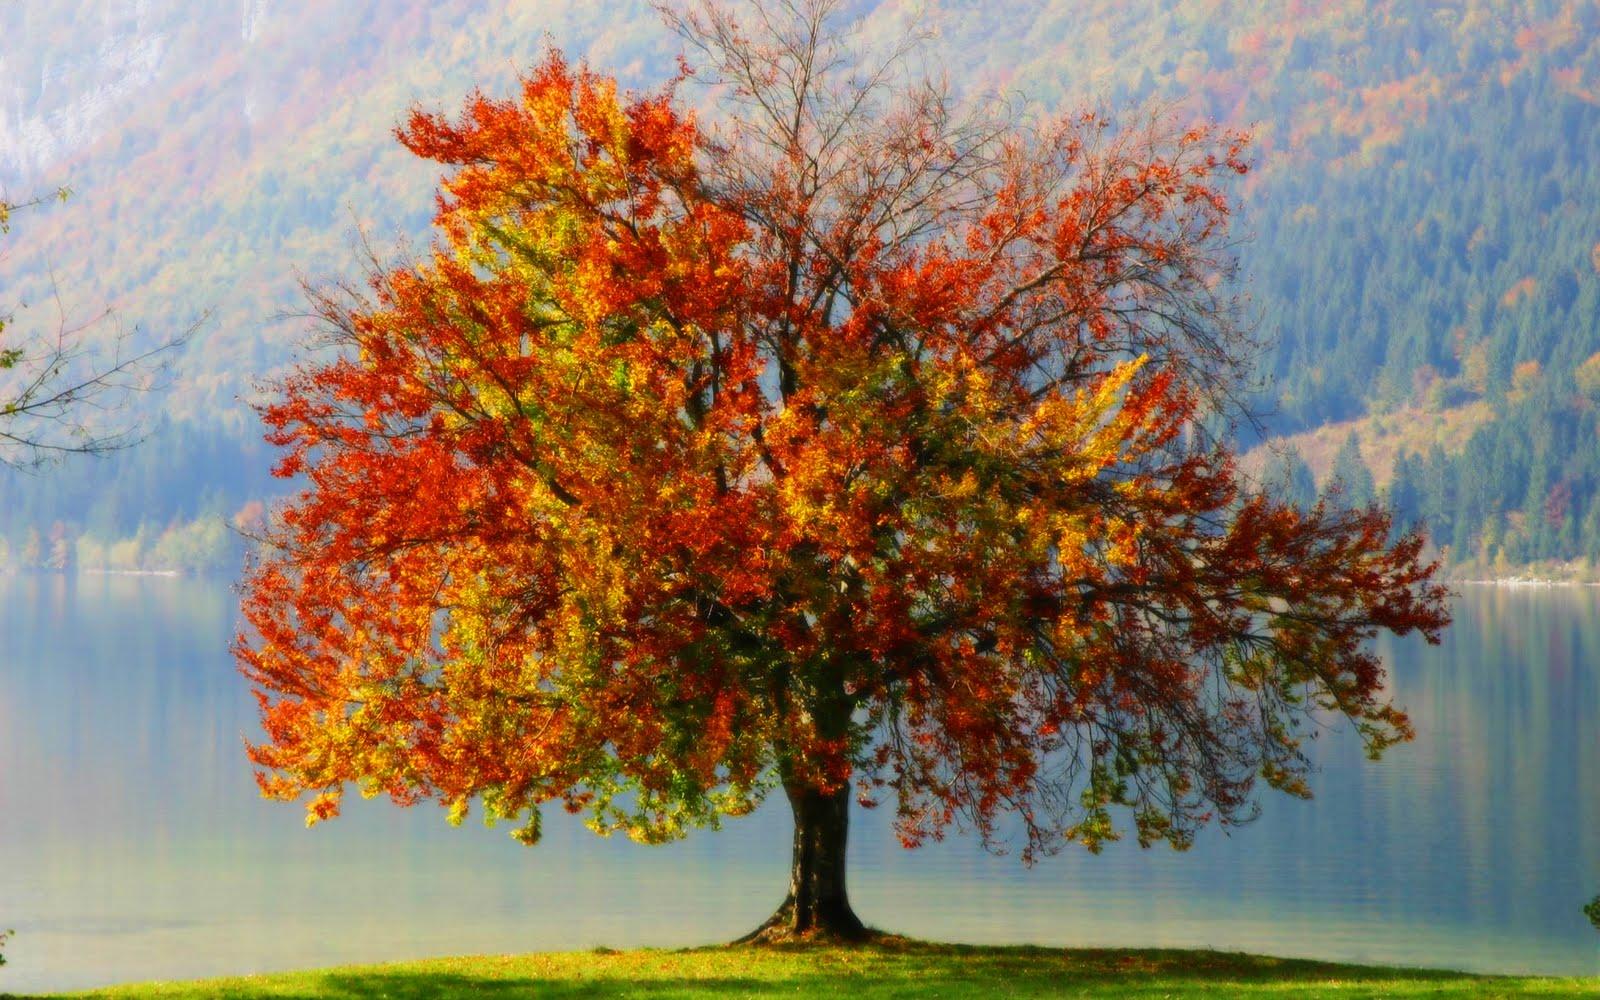 http://2.bp.blogspot.com/_SYCSU5V7huM/TDjHd1WcMFI/AAAAAAAABMM/pB3hCr1j4V4/s1600/autumn_tree_1920.jpg